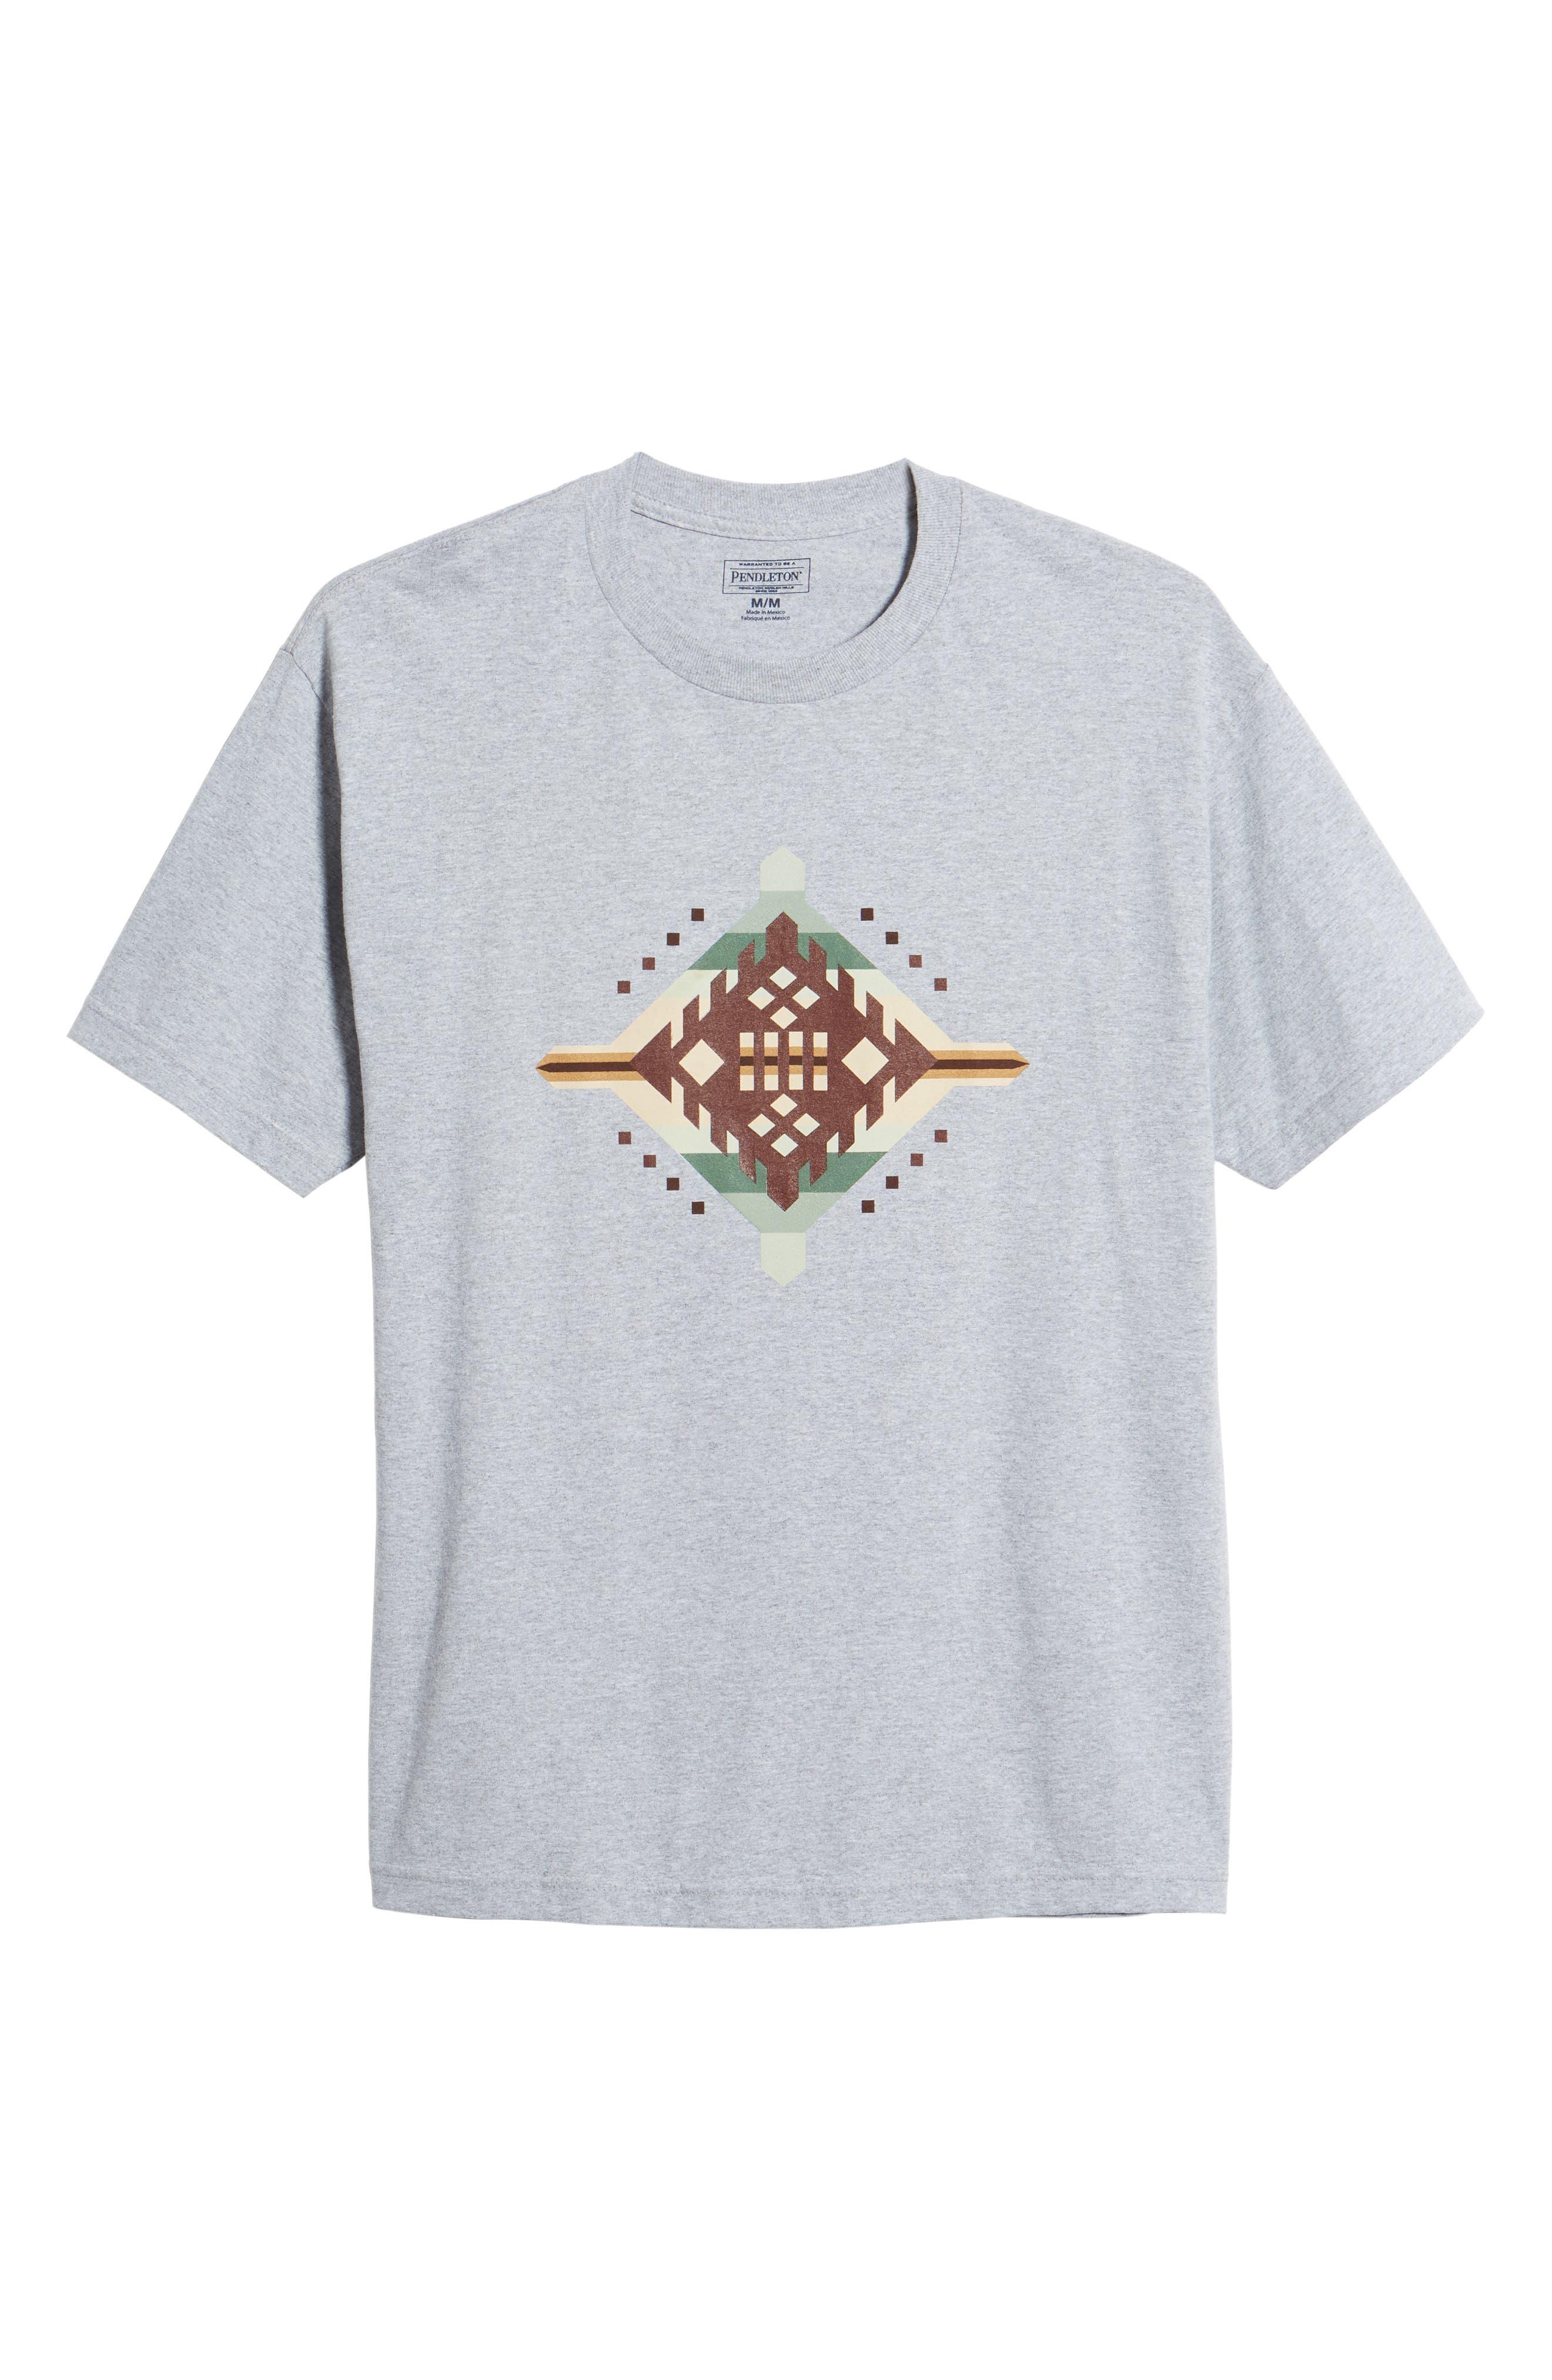 Crewneck T-Shirt,                             Alternate thumbnail 6, color,                             Gray Mesquite Canyon